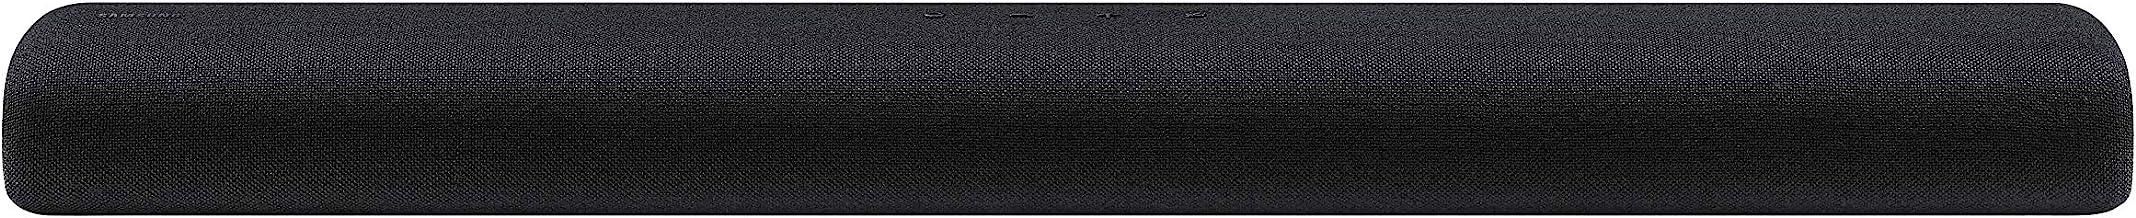 SAMSUNG HW-S60T 4.0ch All-in-One Soundbar with Alexa Built-in (2020)